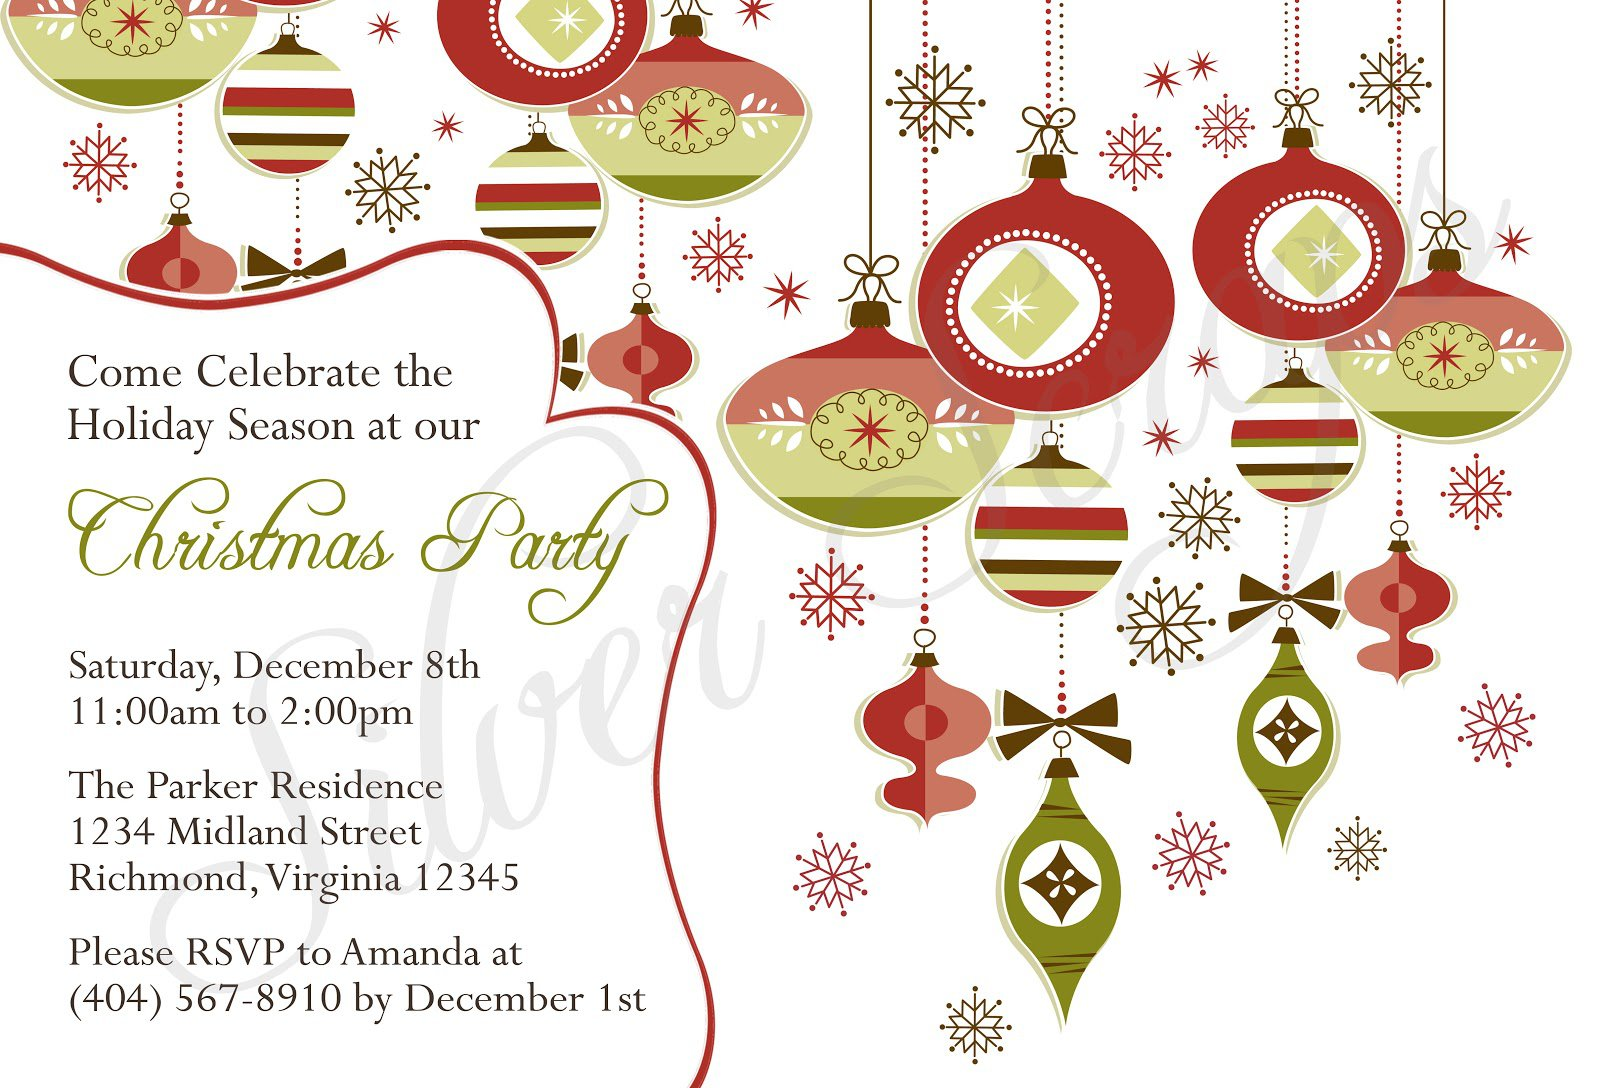 free christmas party invitation templates - religious christmas invitation templates